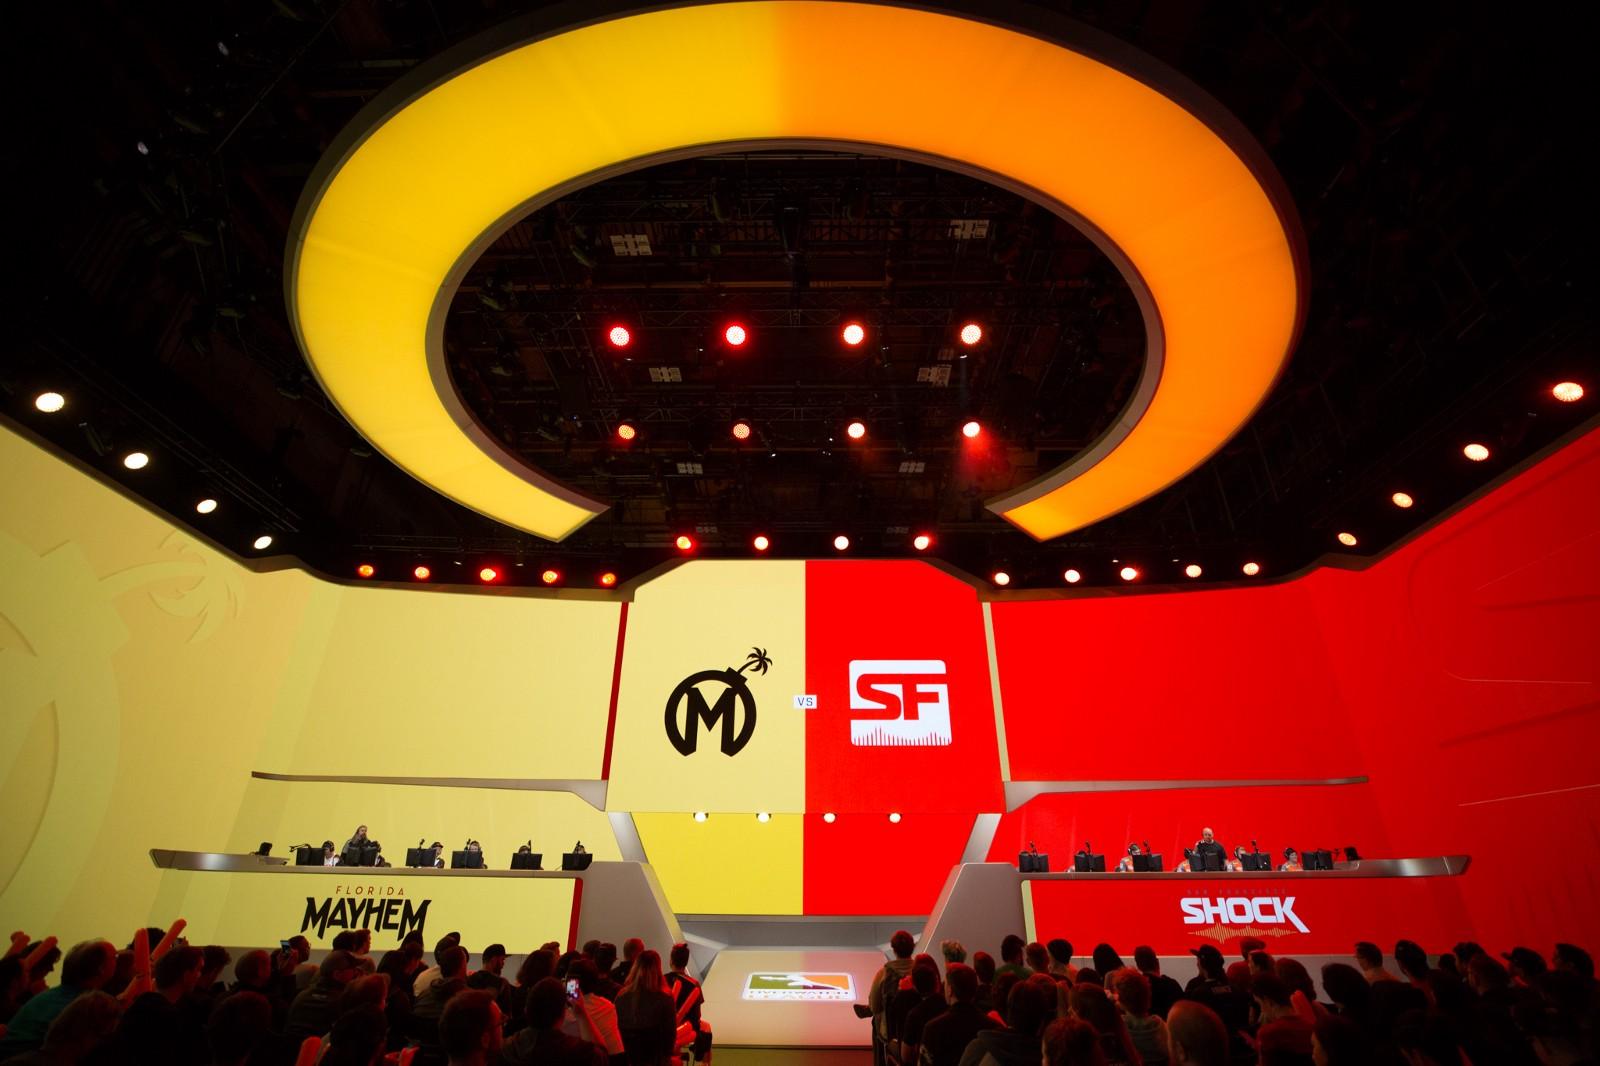 Team branding looks pretty good on the big screen (Photo: Robert Paul)